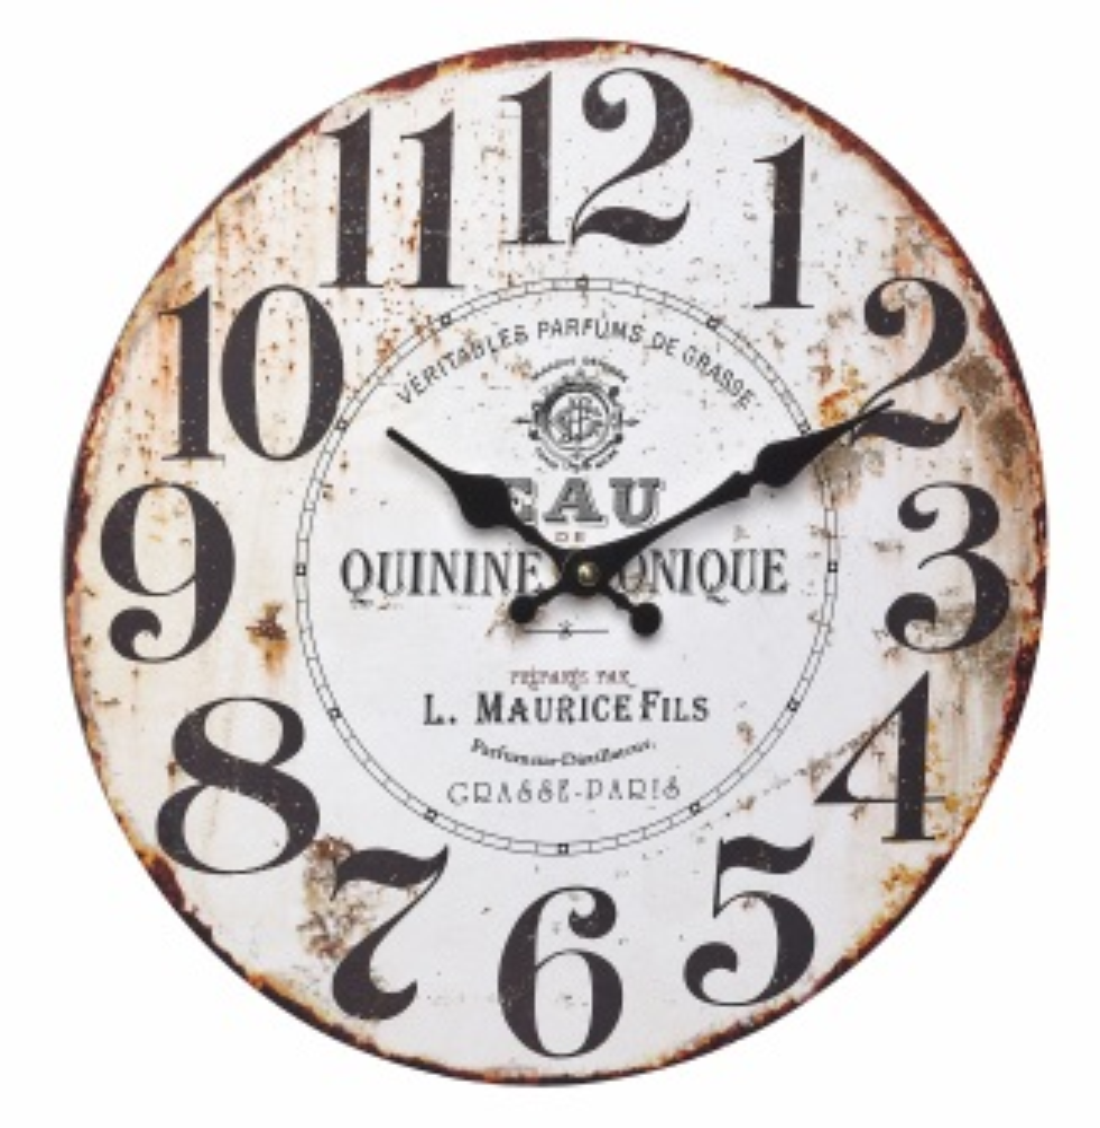 TFA Dostmann Vintage hodiny, Quinine tonique TFA 60.3045.10